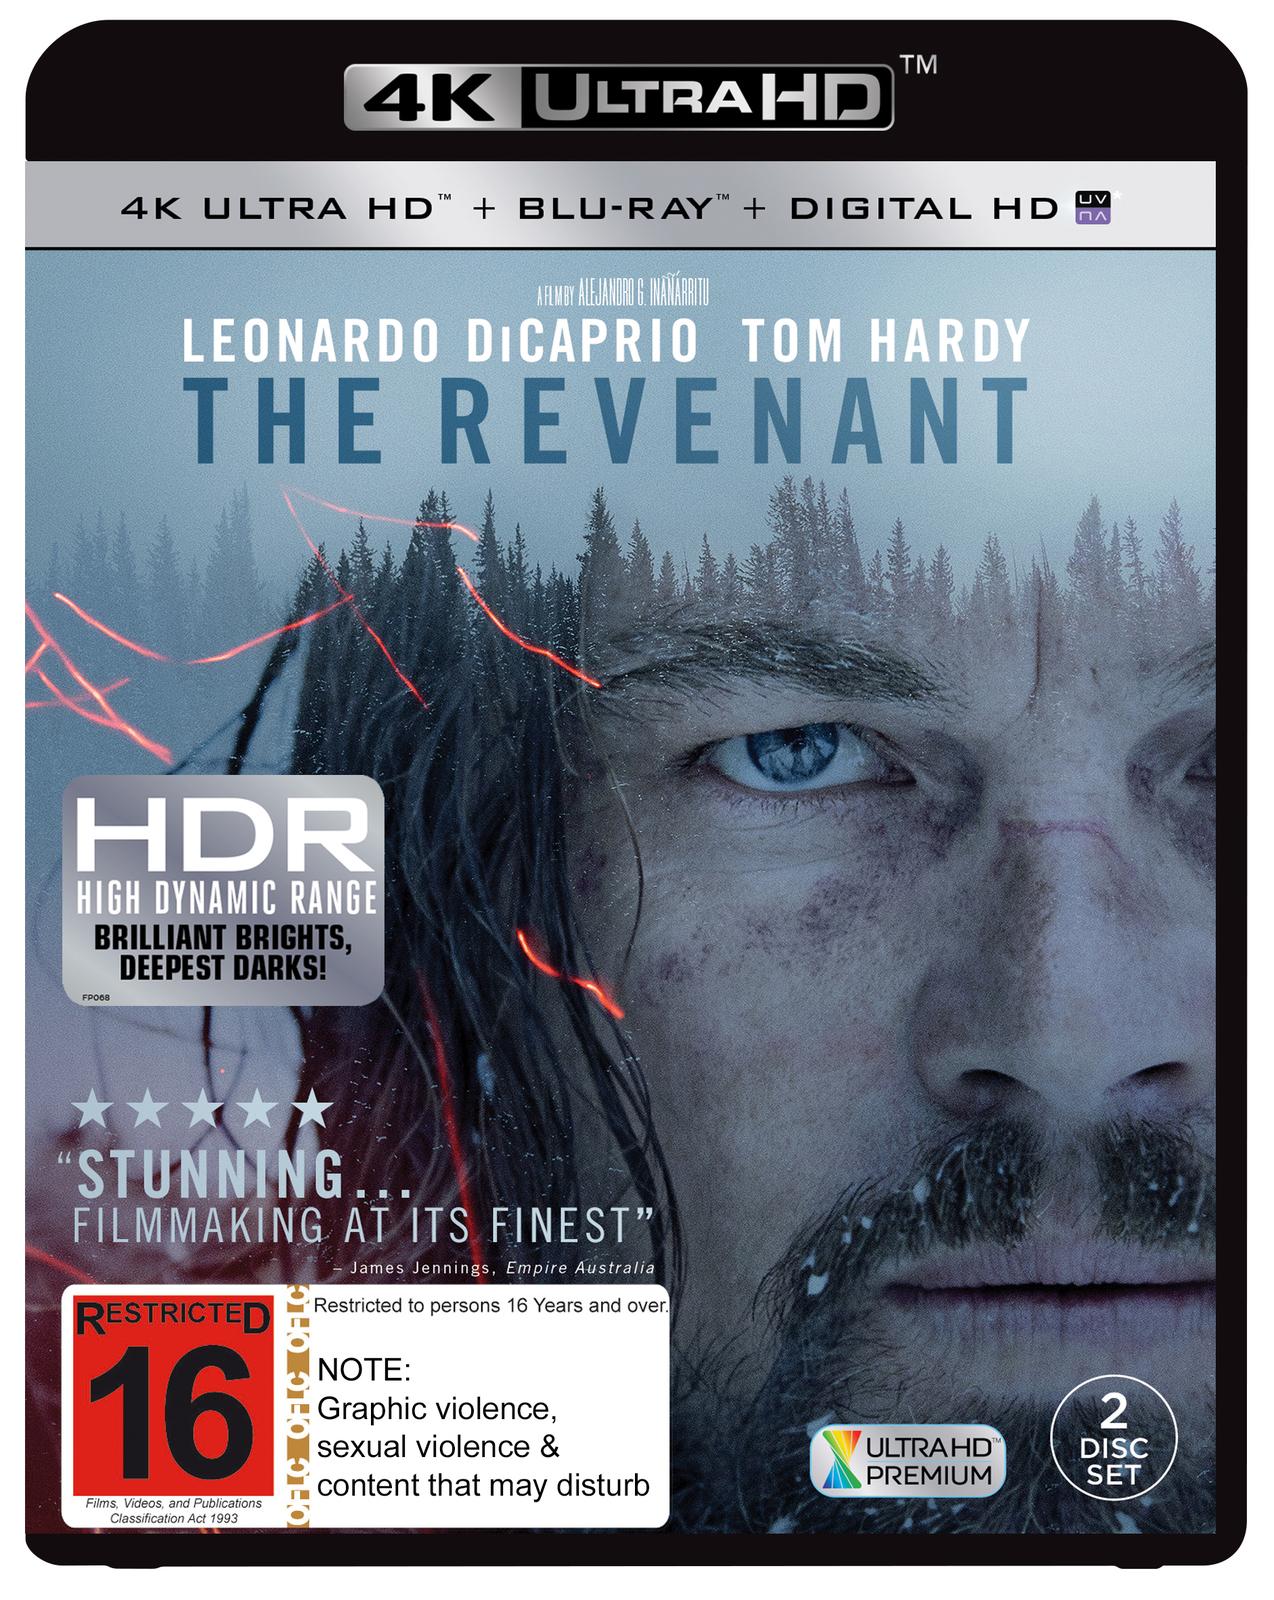 The Revenant on Blu-ray, UHD Blu-ray, UV image